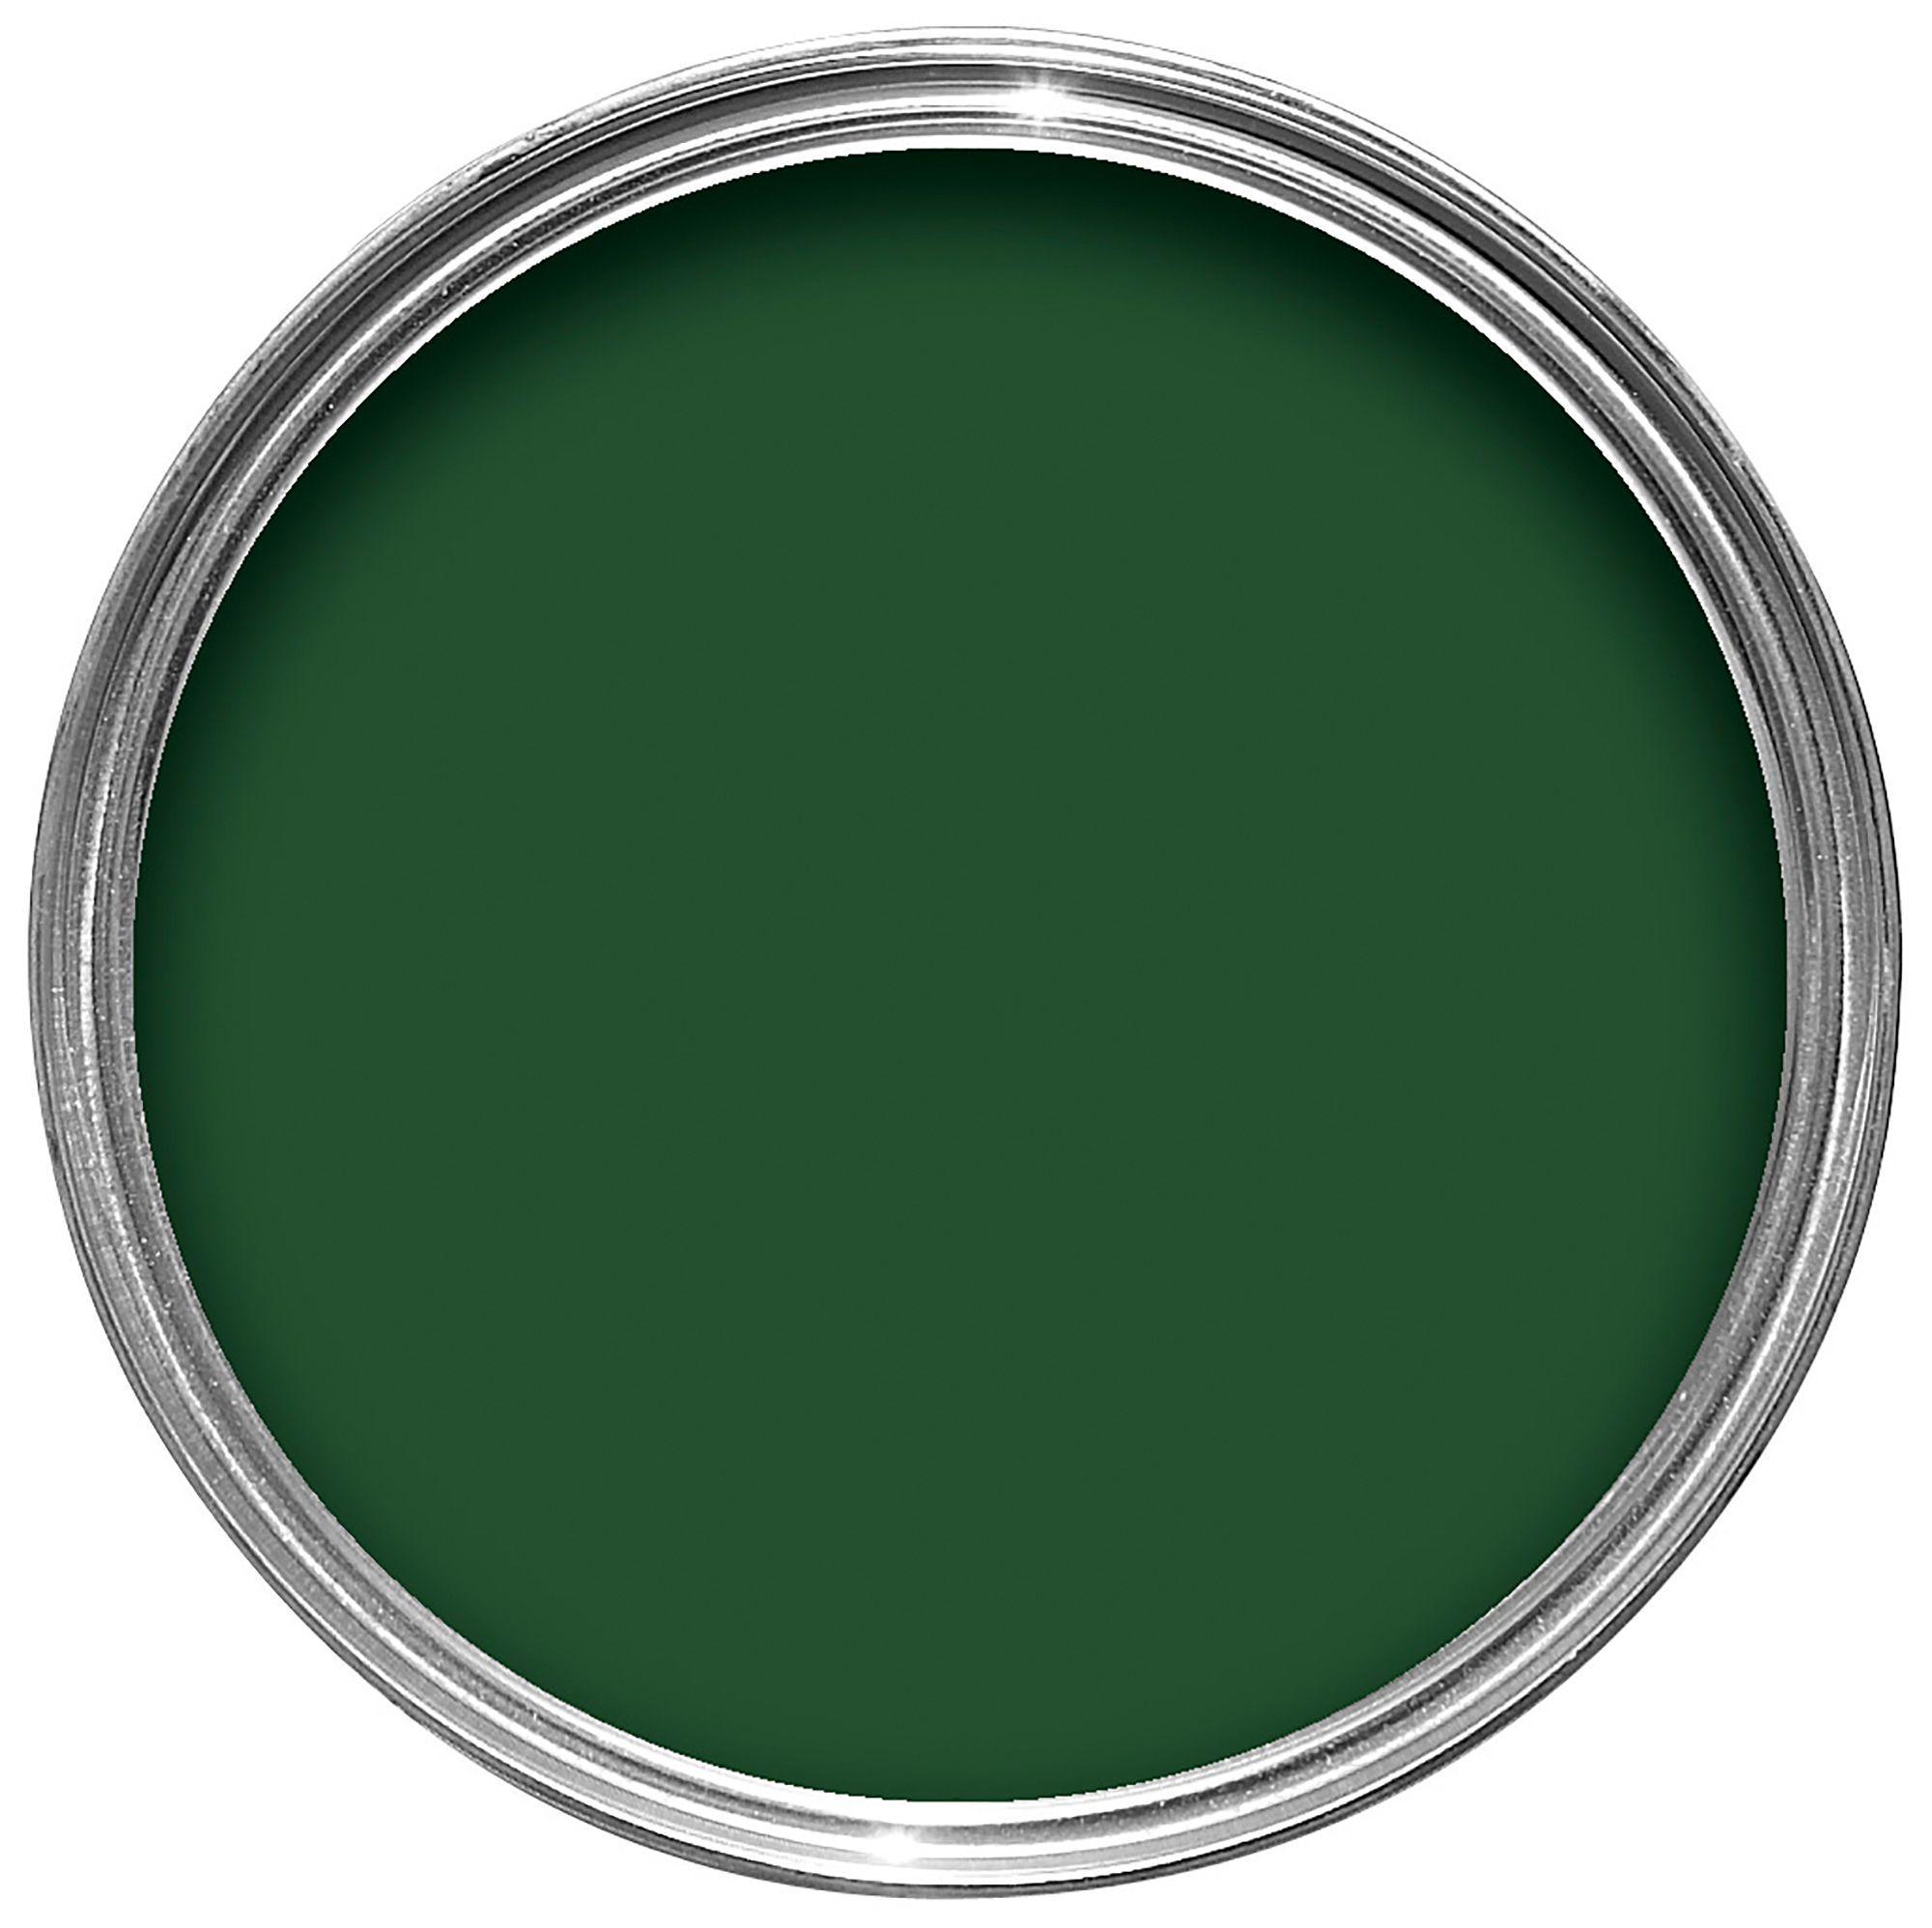 Colours Exterior Buckingham Green Gloss Wood U0026 Metal Paint 2.5L |  Departments | DIY At